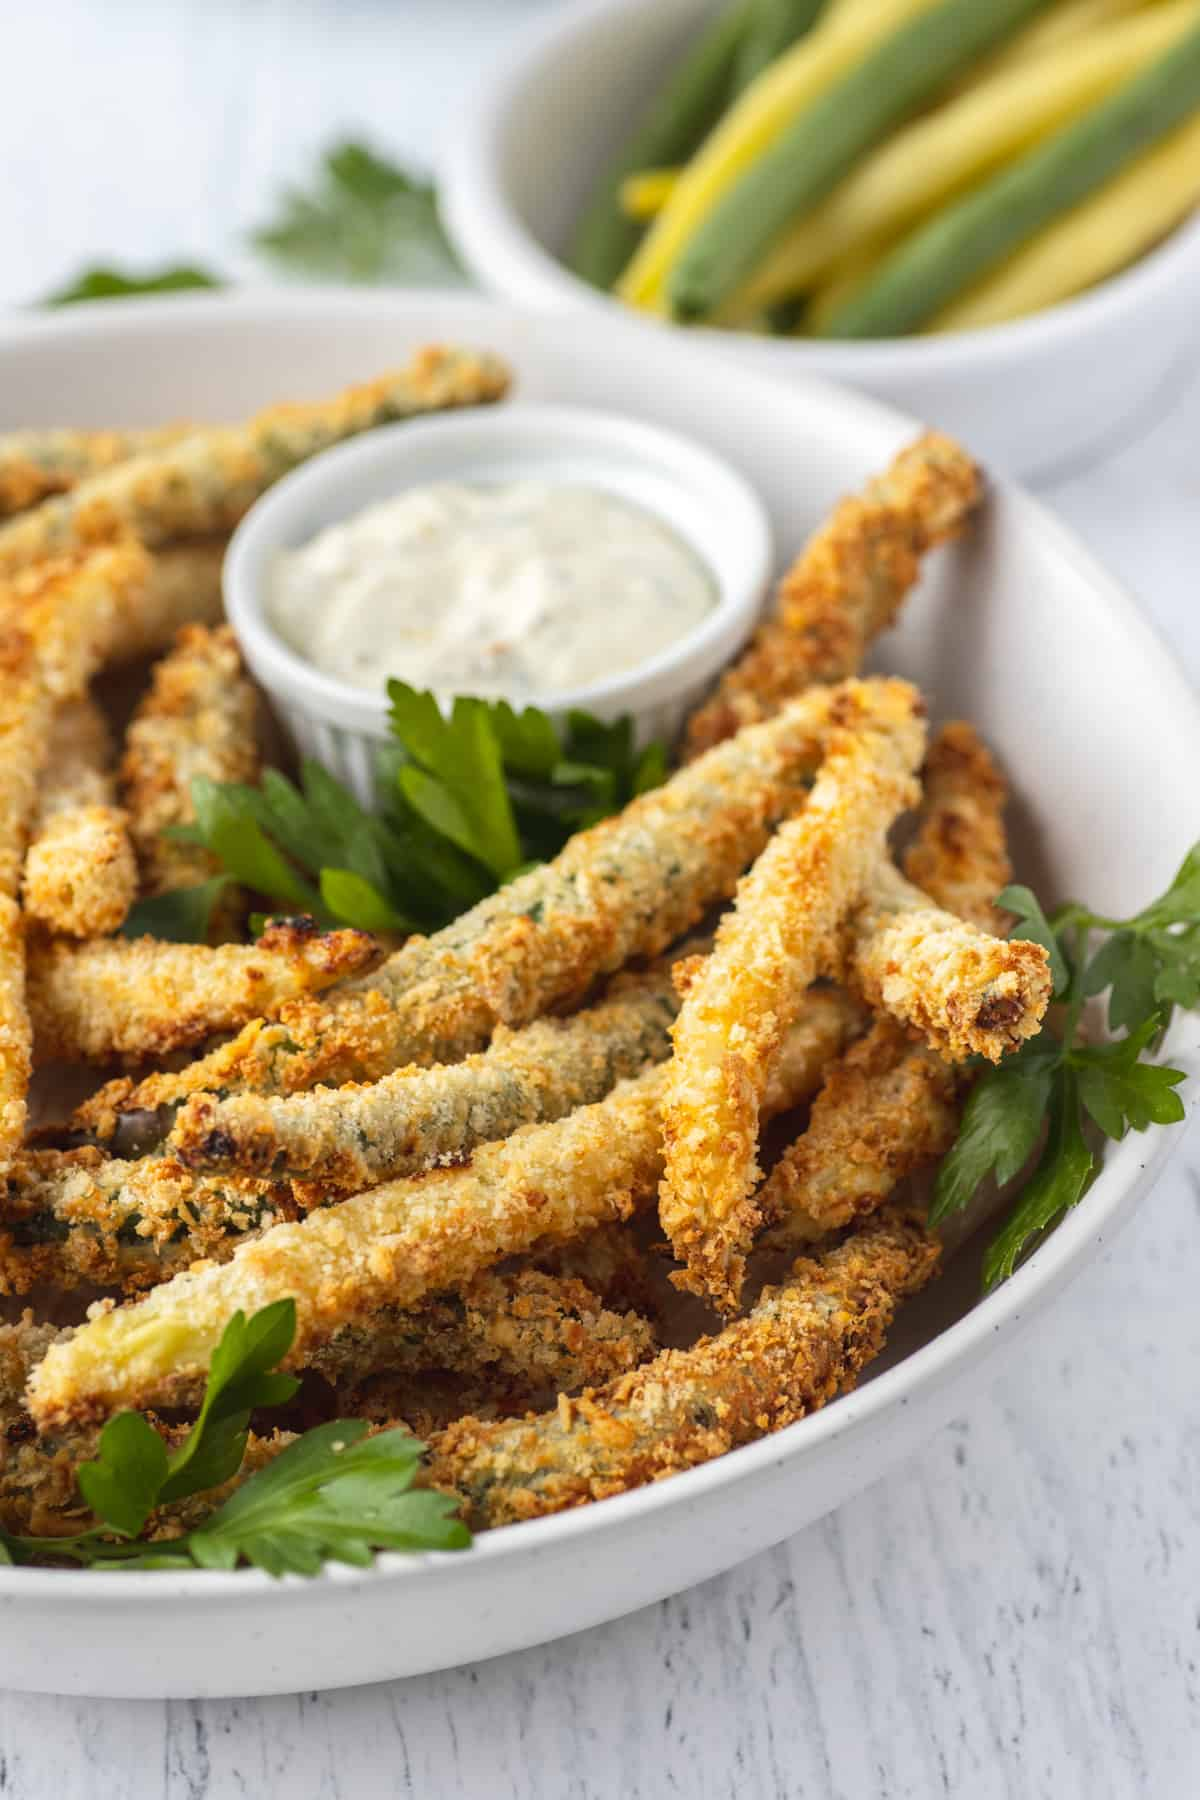 Crispy Parmesan Air Fryer Green Beans (Oven Instructions too)